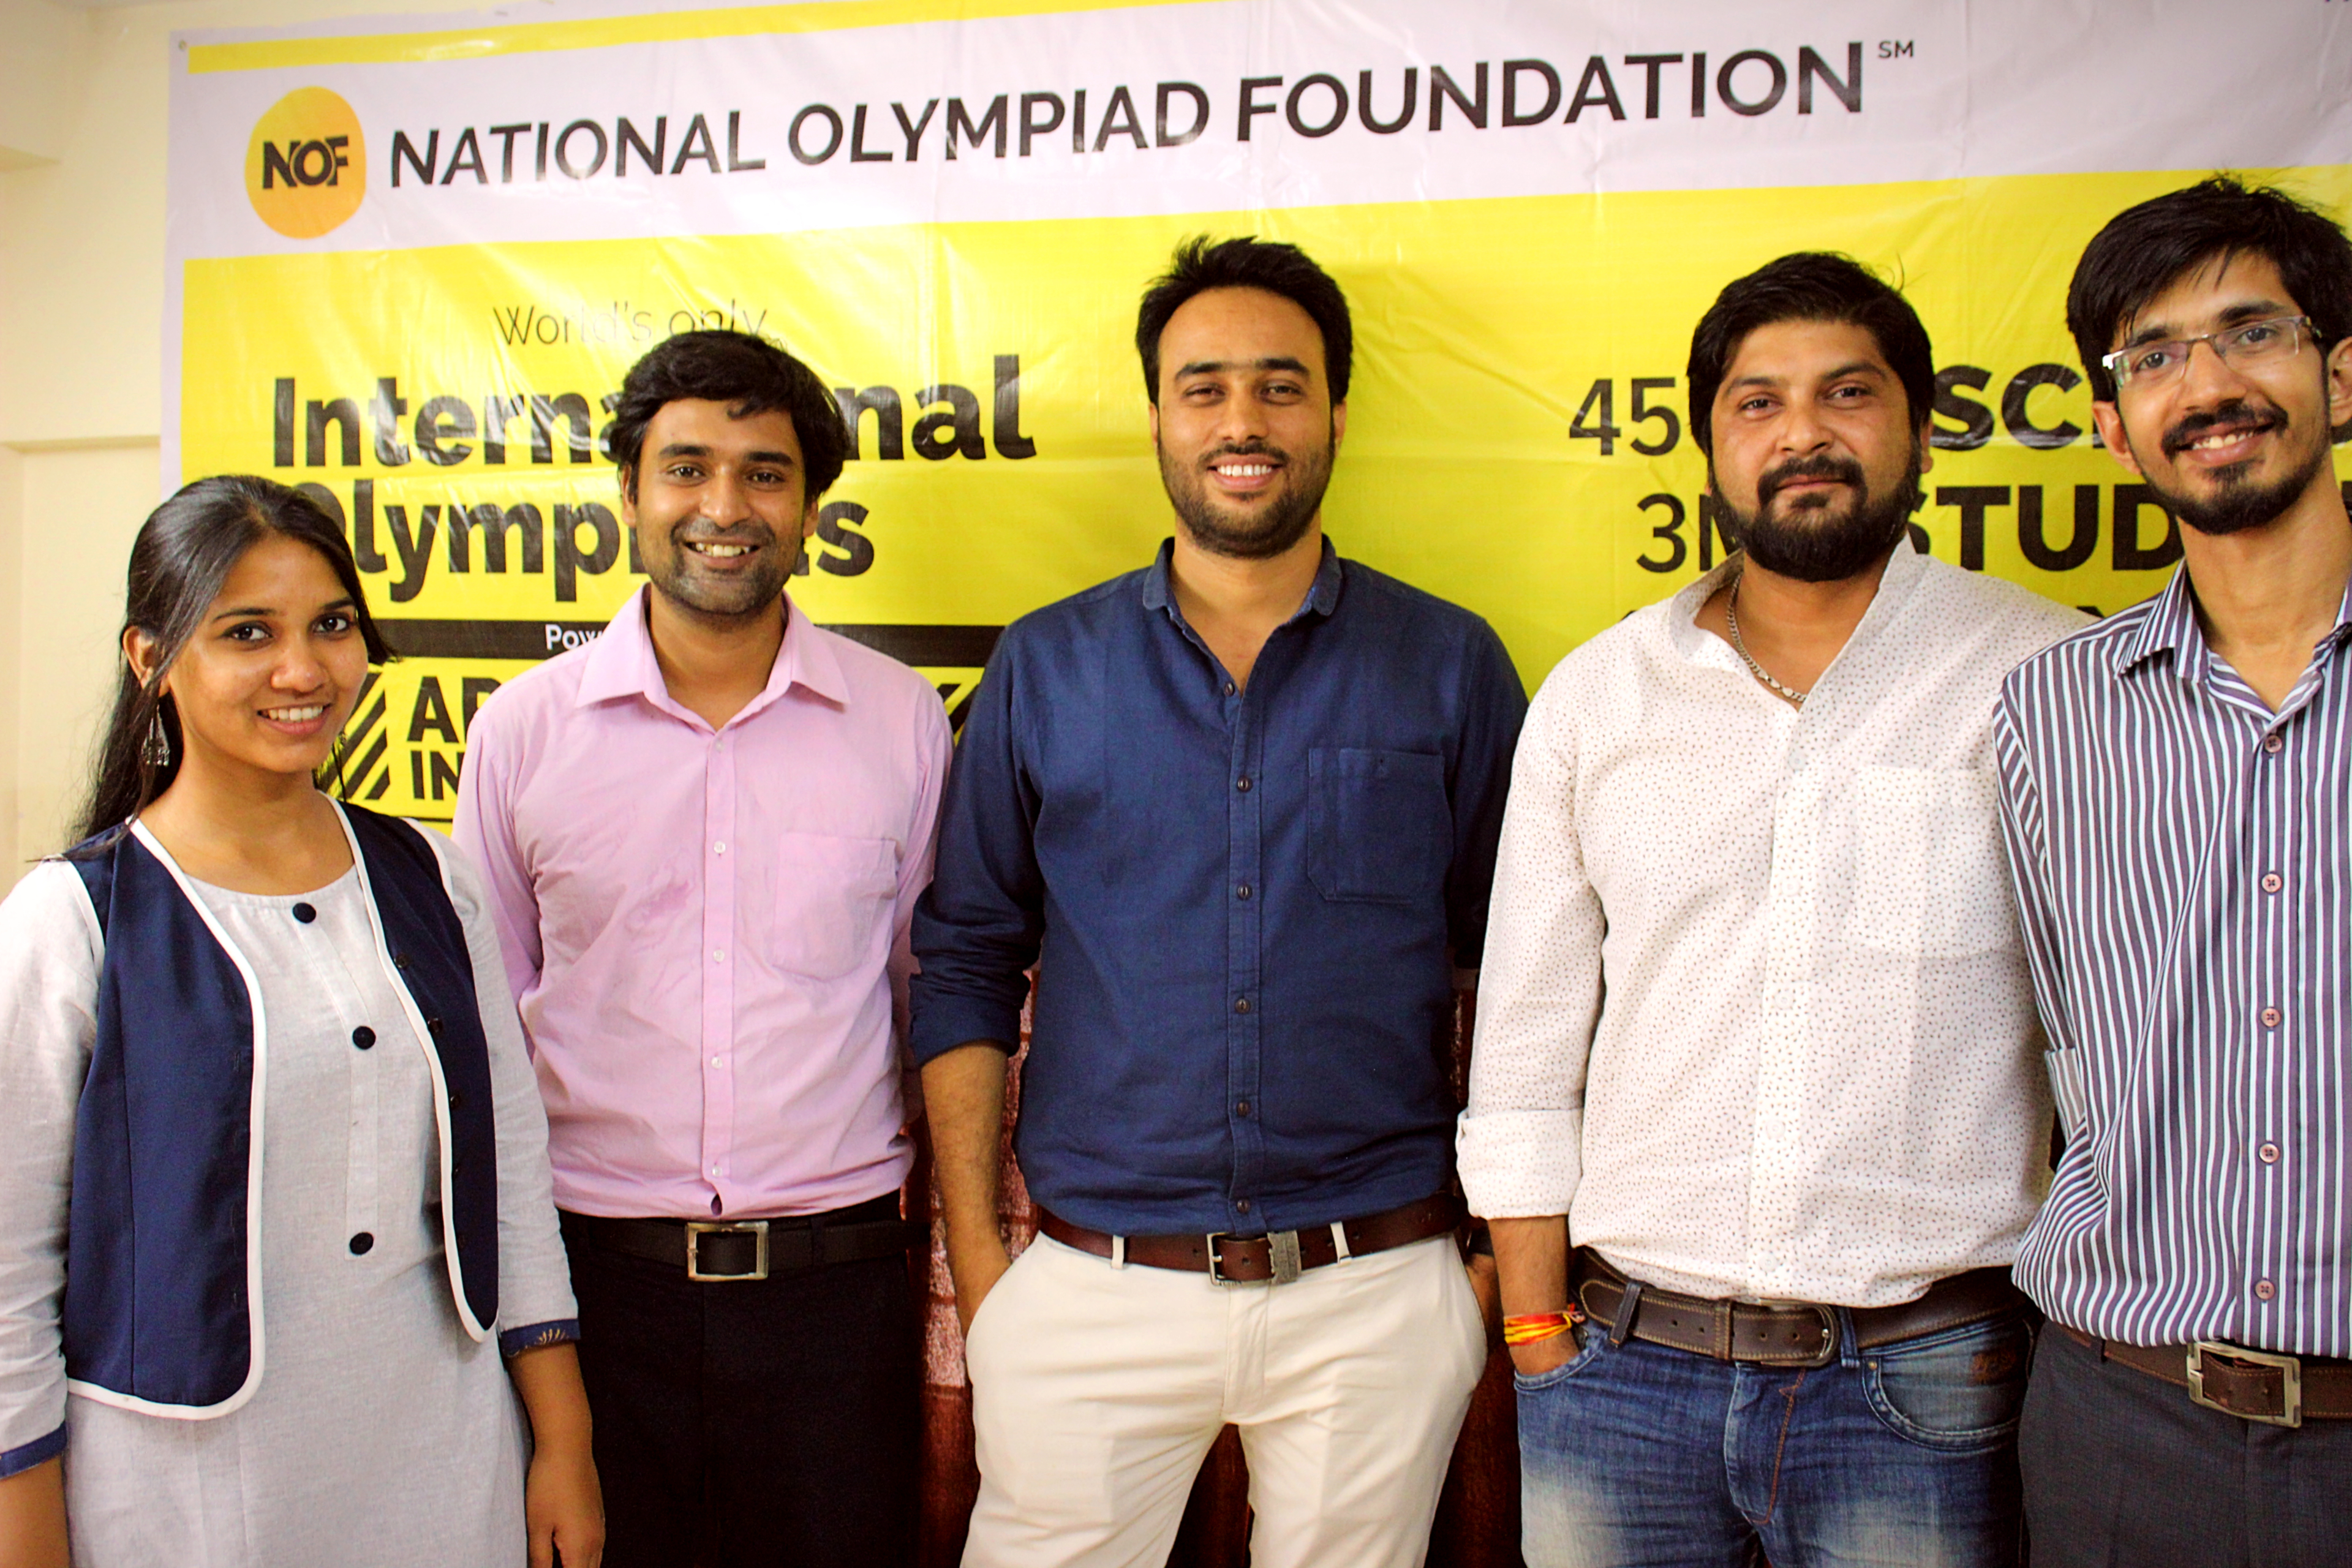 Pic from left to right - Anjali Bansiwal, Atul Dubey, Amit Patel, Sandesh Vyas, Sachin Yadav